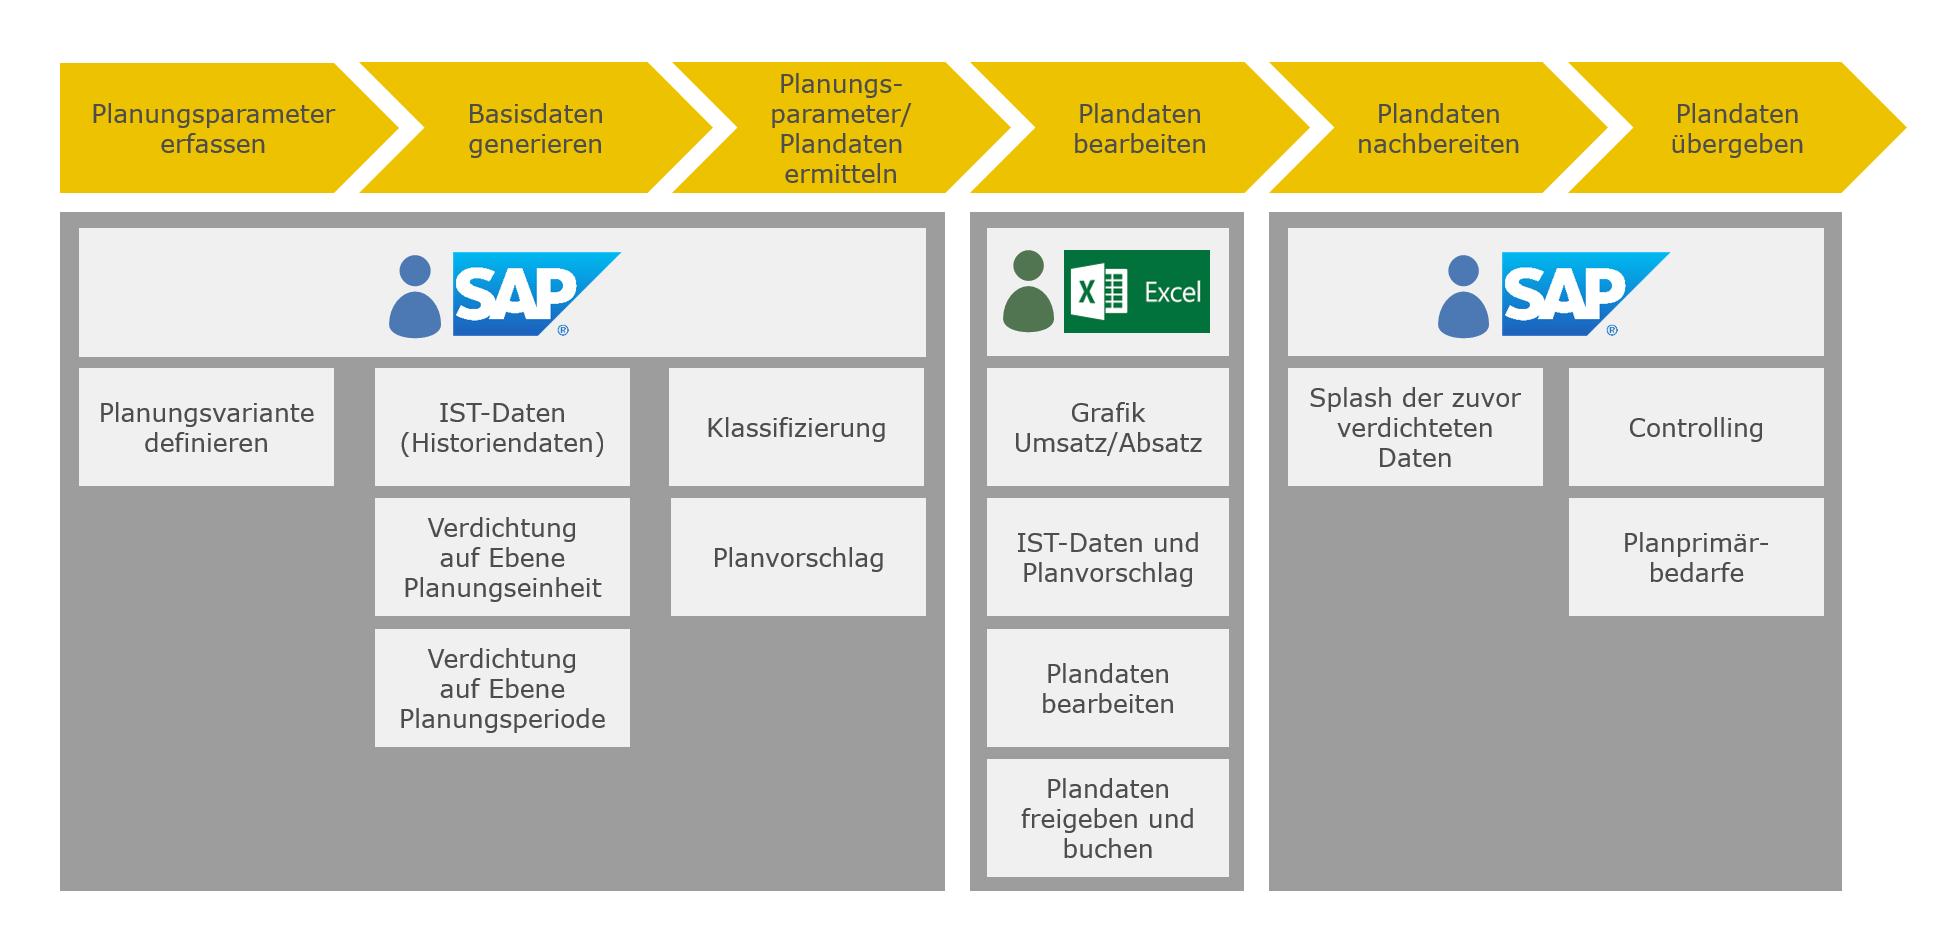 "Blog Grafik Sales Planner for SAP S4HANA Planungsprozess - Integrierte Umsatz- und Absatzplanung mit dem ""Innovabee Sales Planner for SAP S/4HANA"""